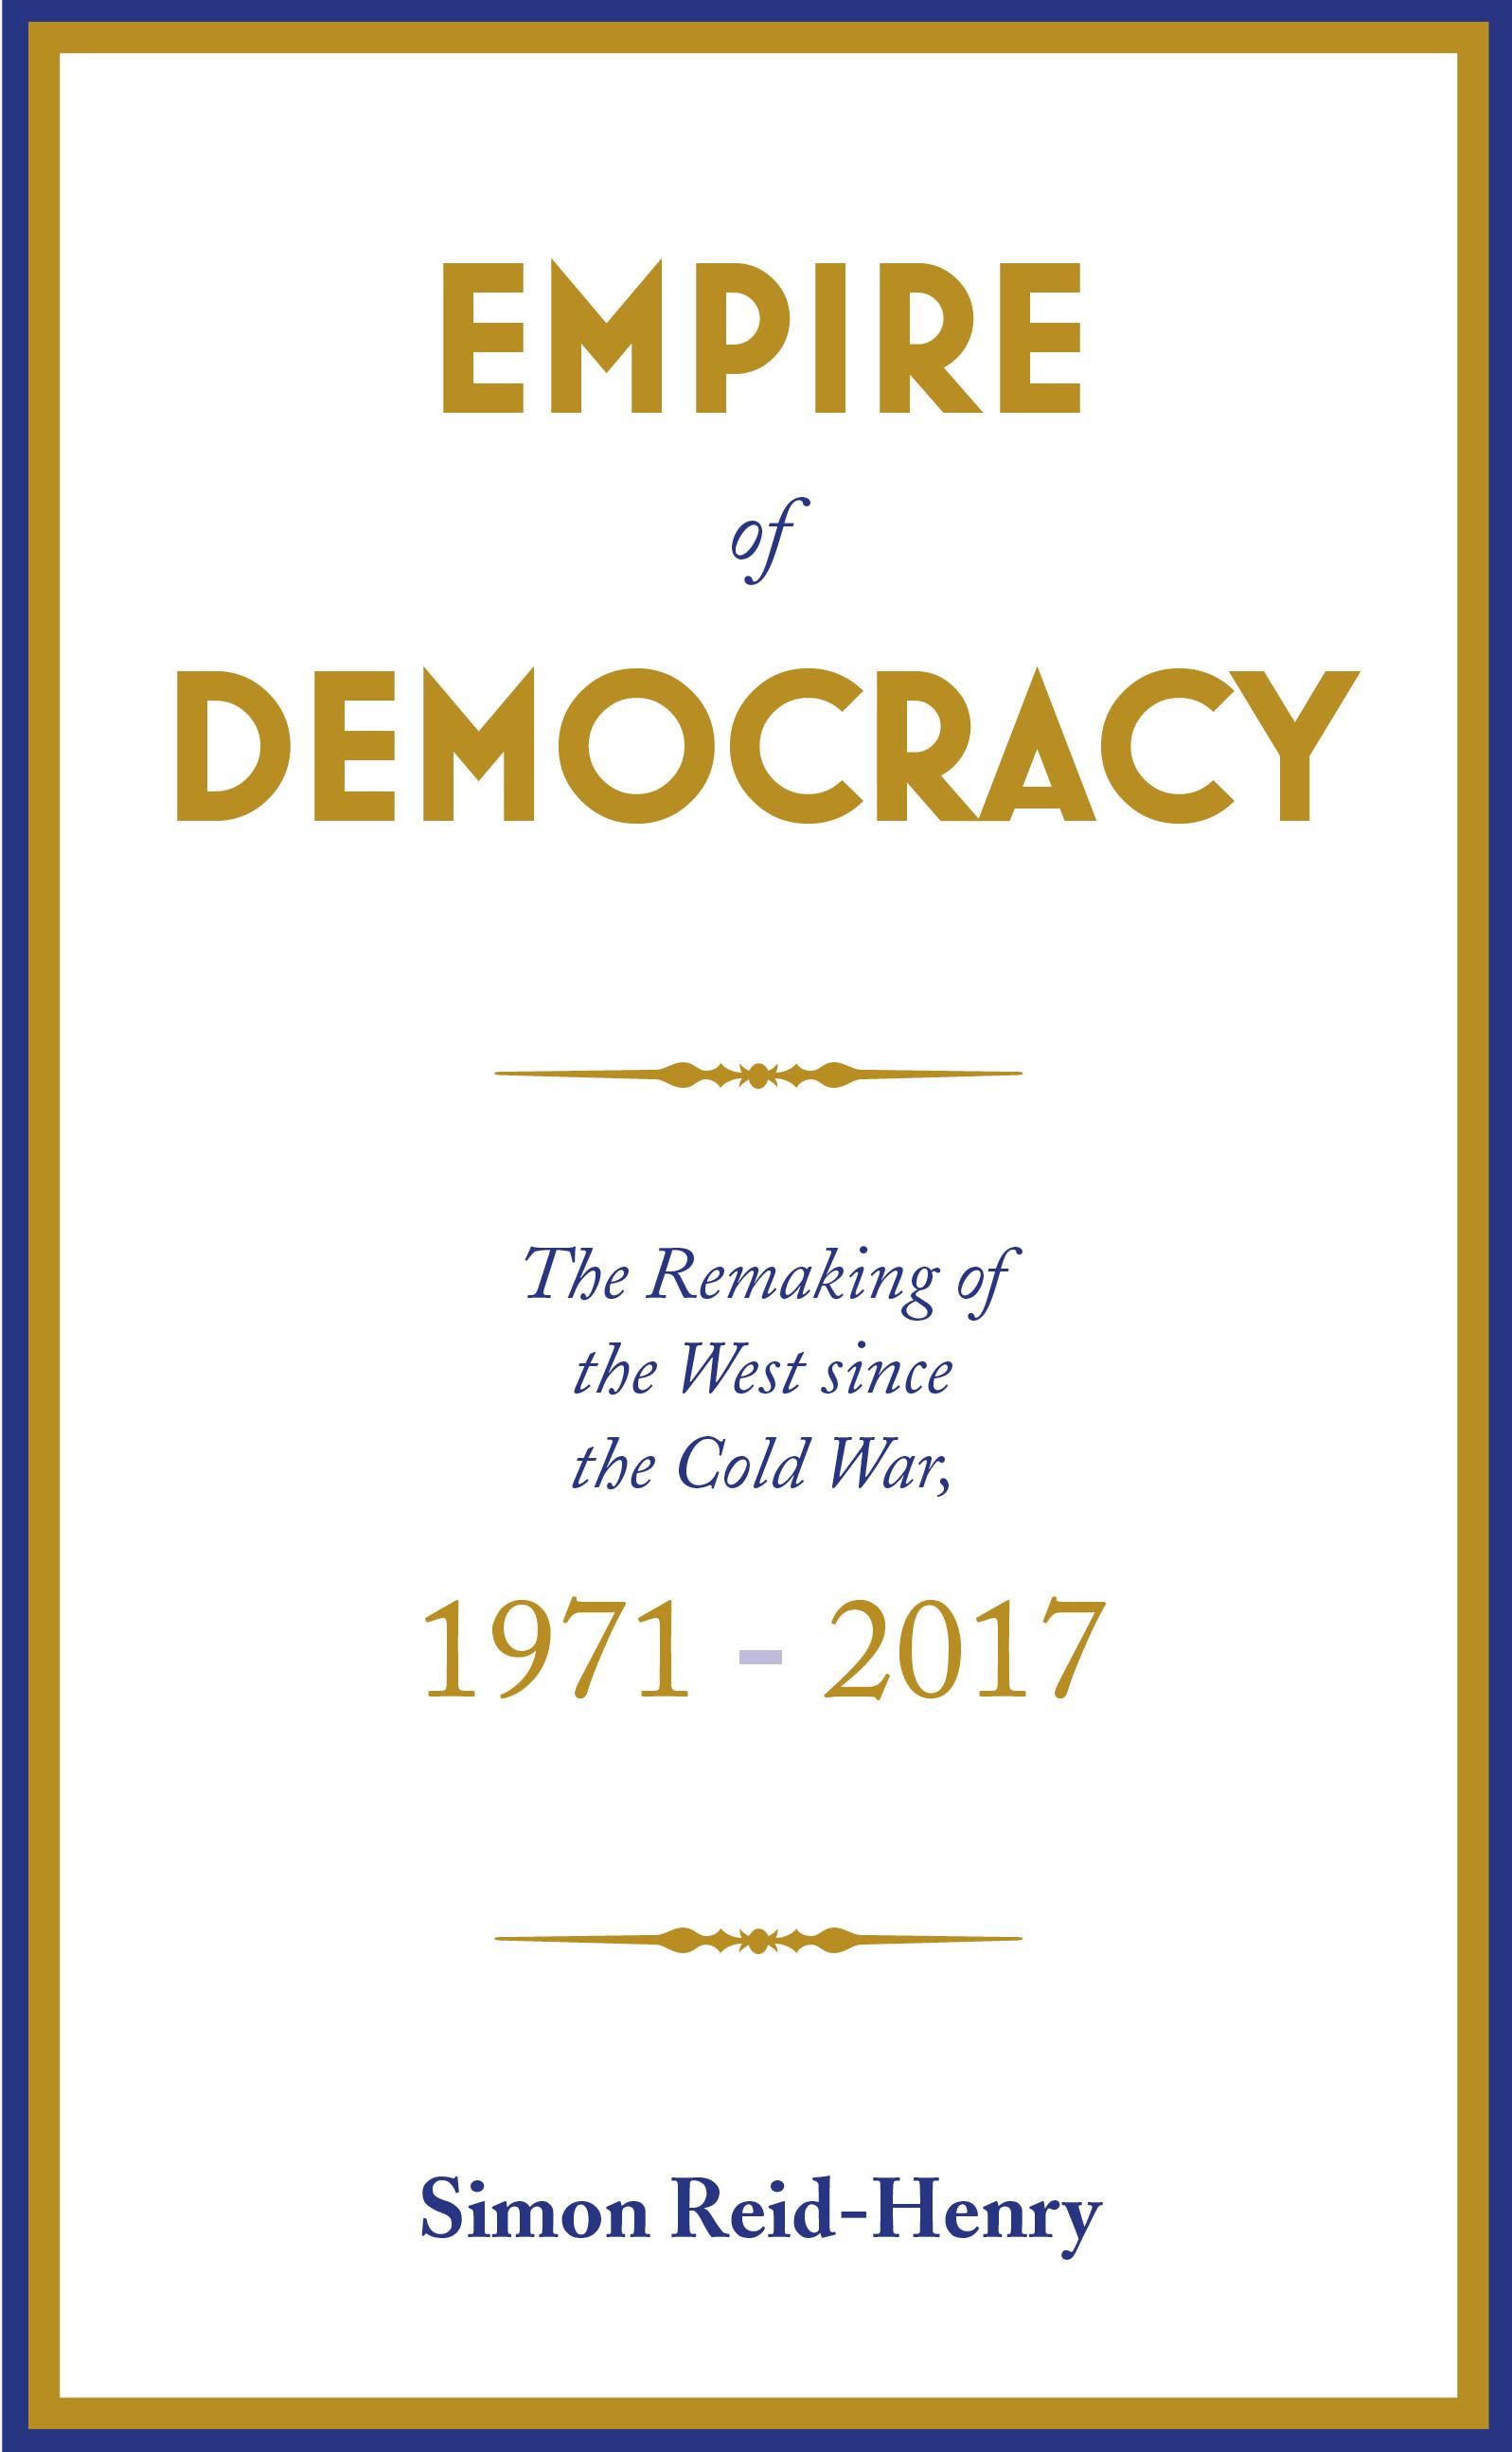 Empire of Democracy_2.jpg